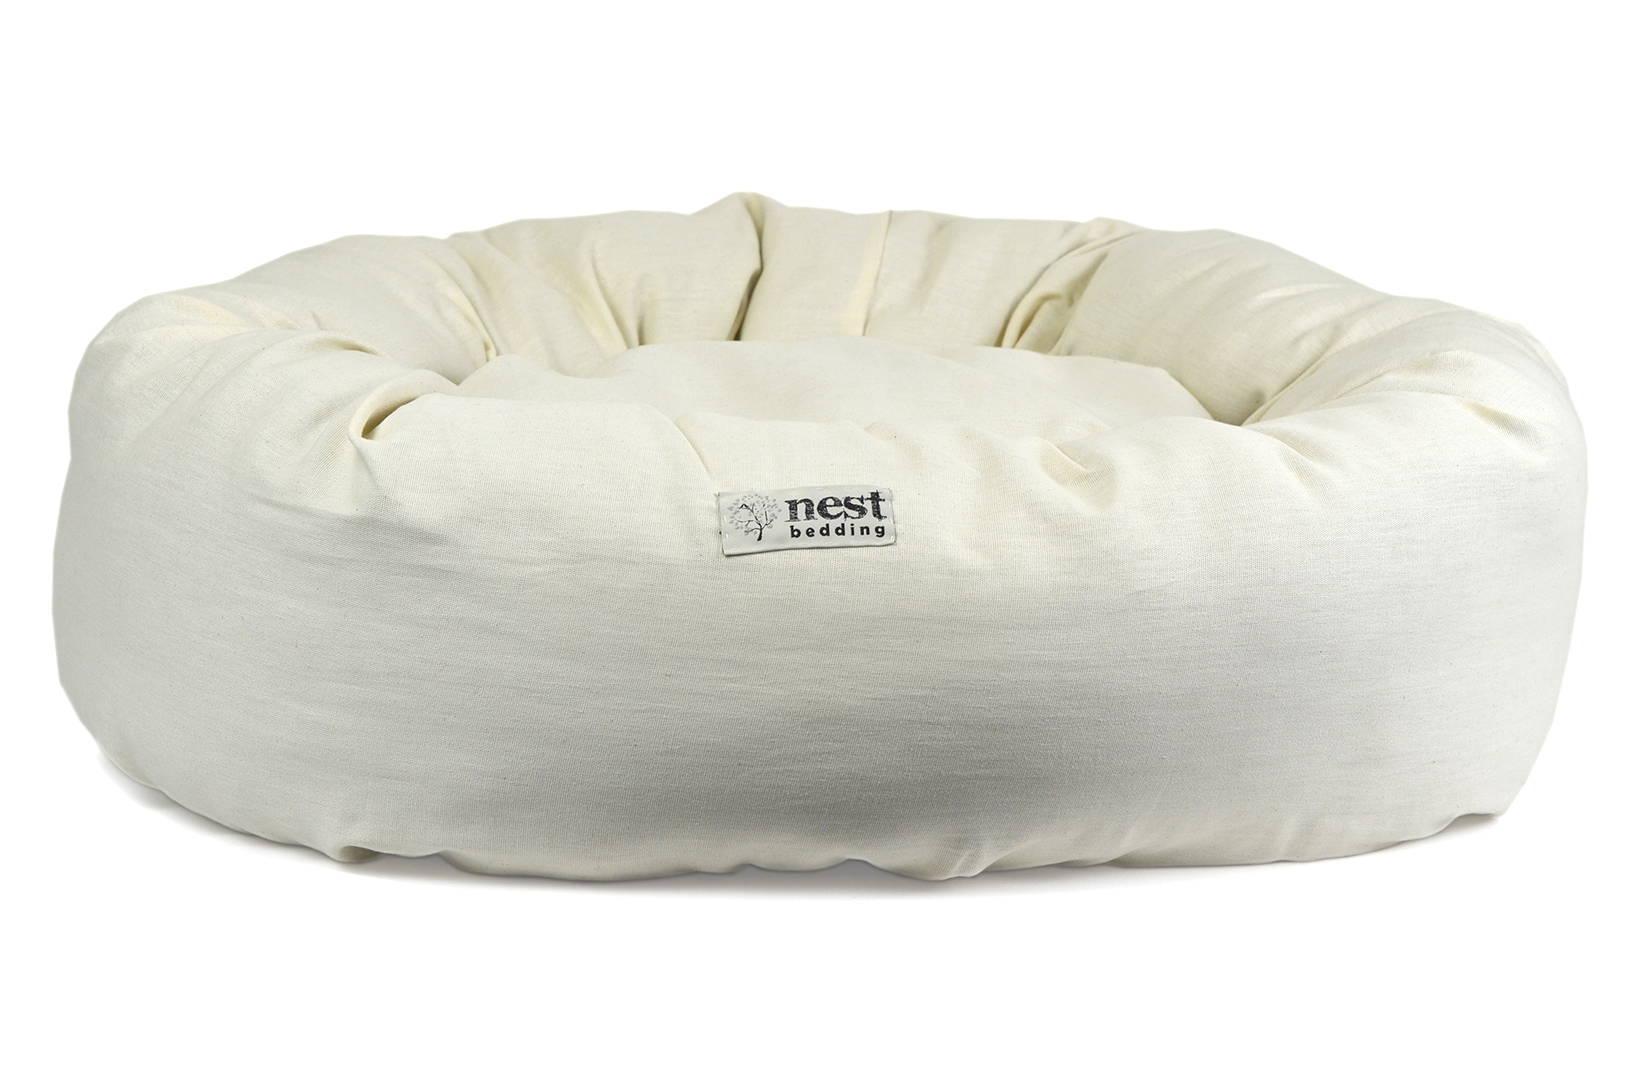 Bolstered Natural Pet Bed